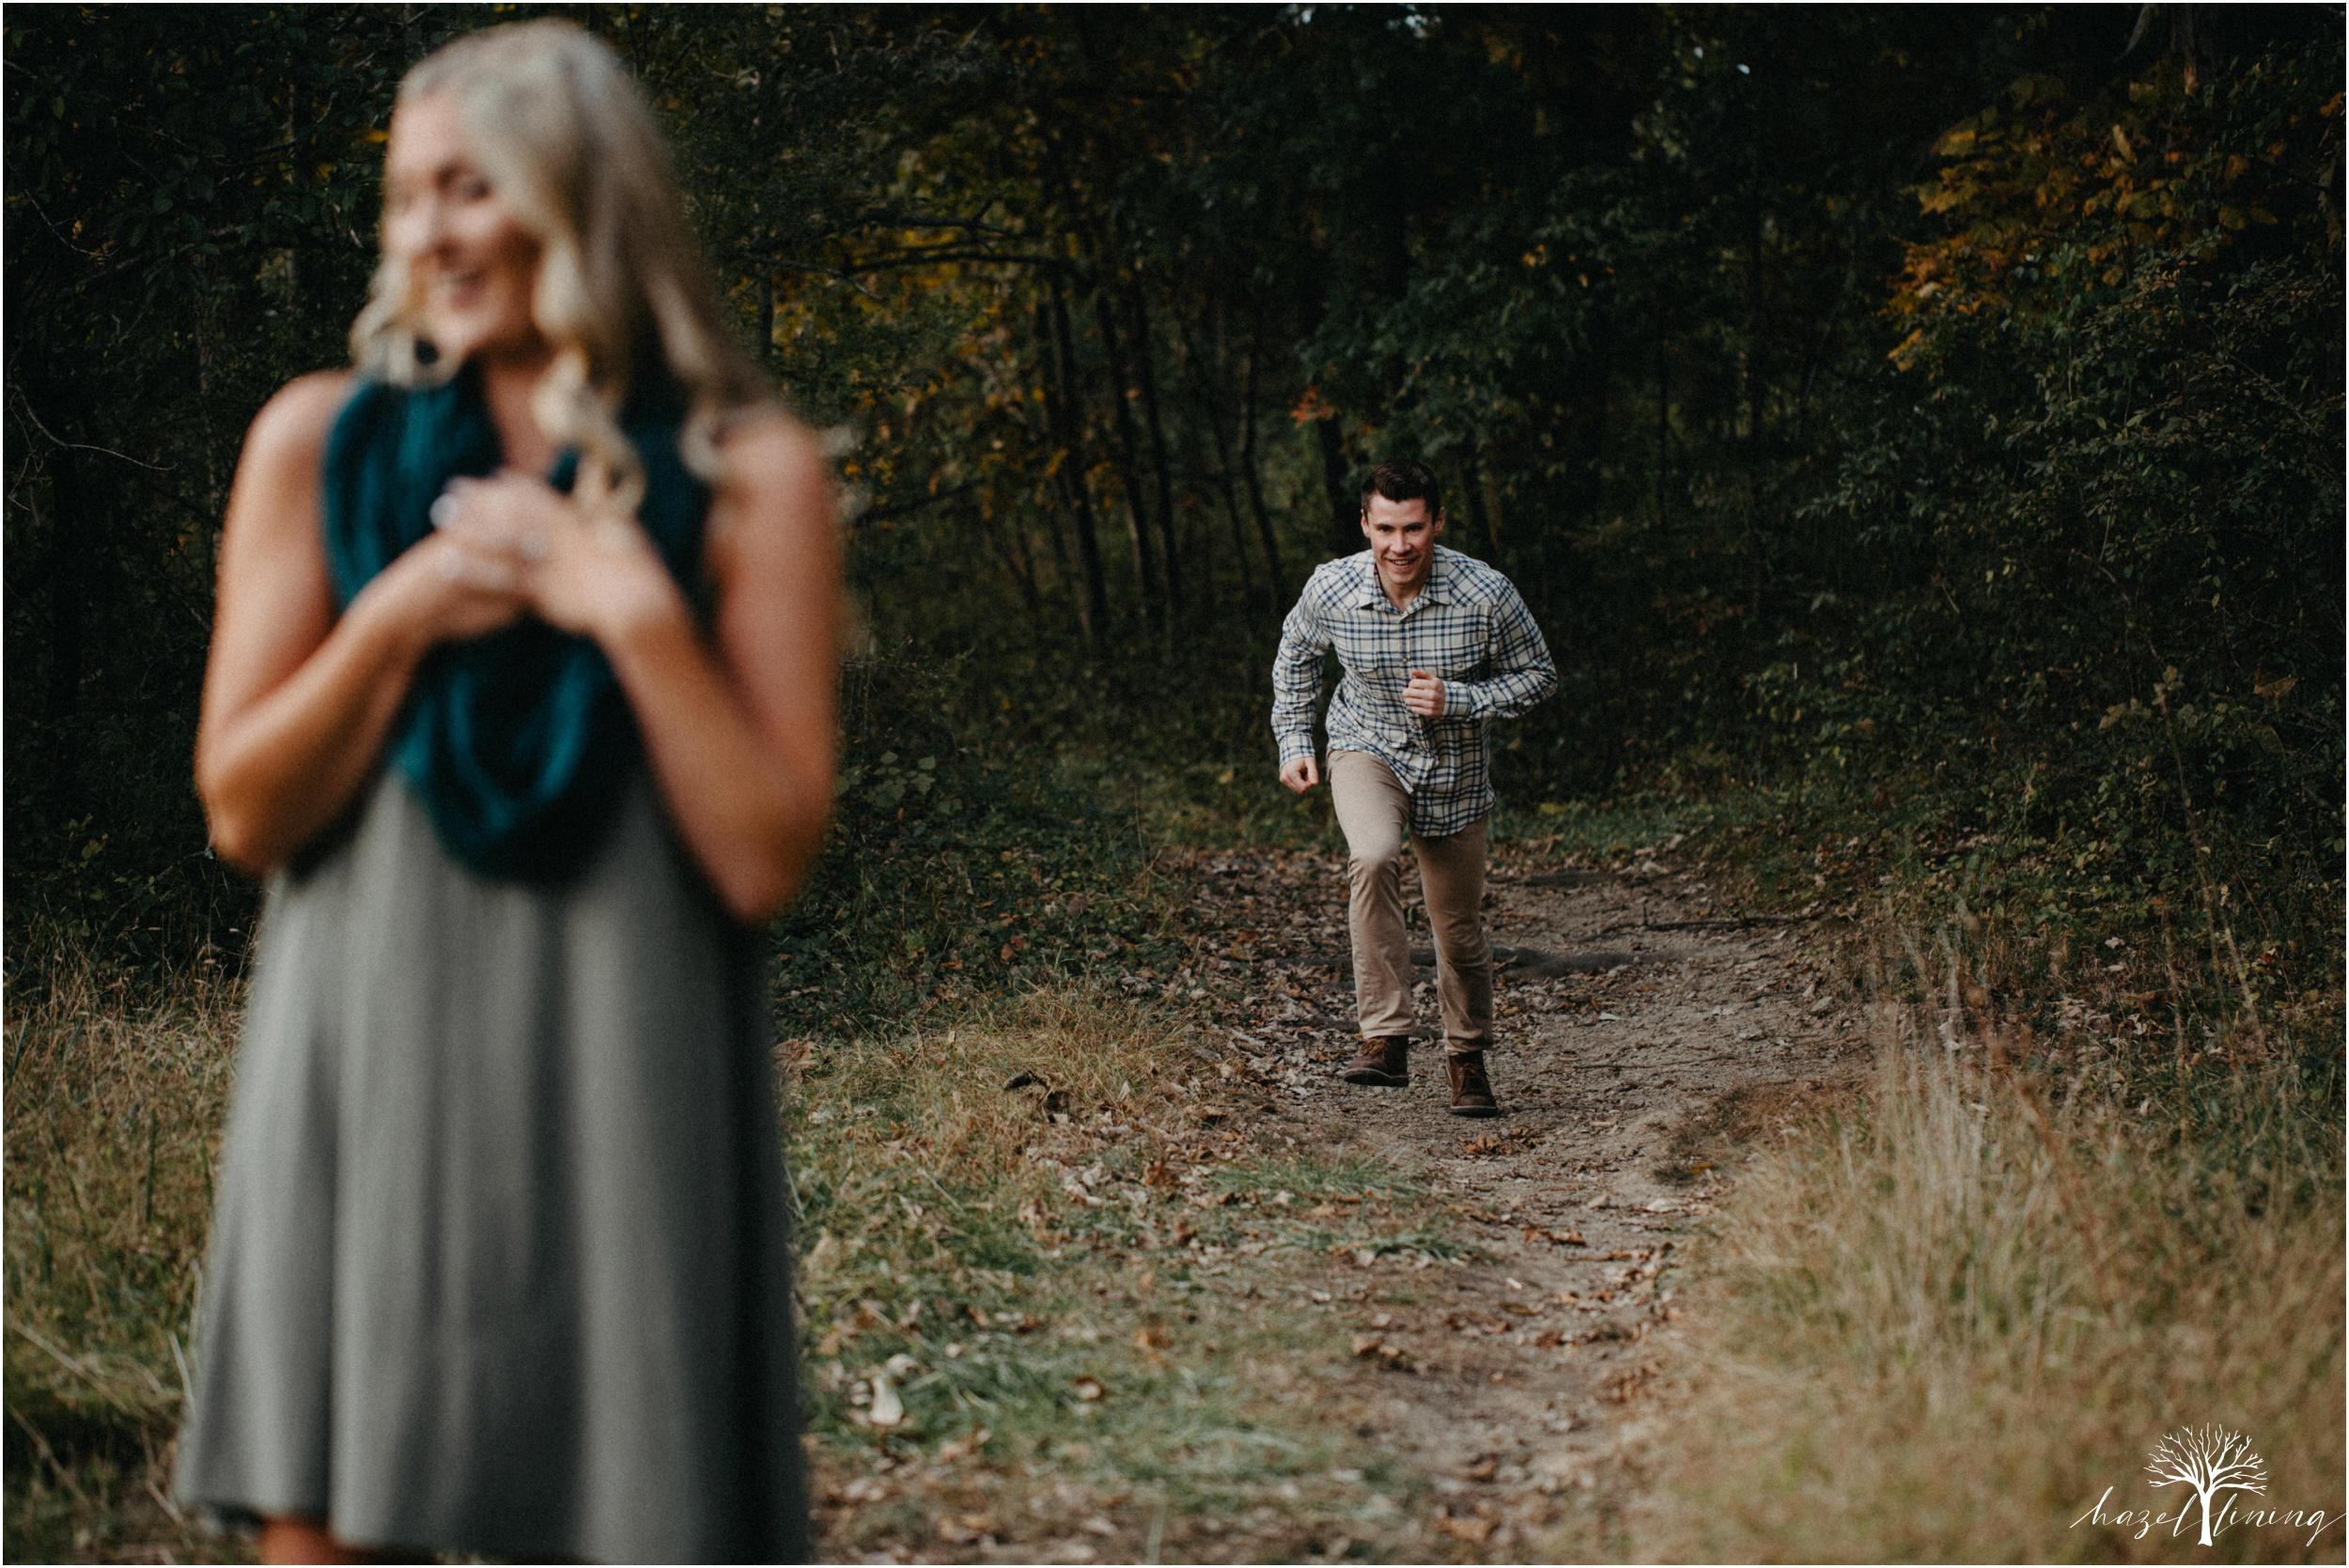 Jess & David: Engagement — Hazel Lining Photography